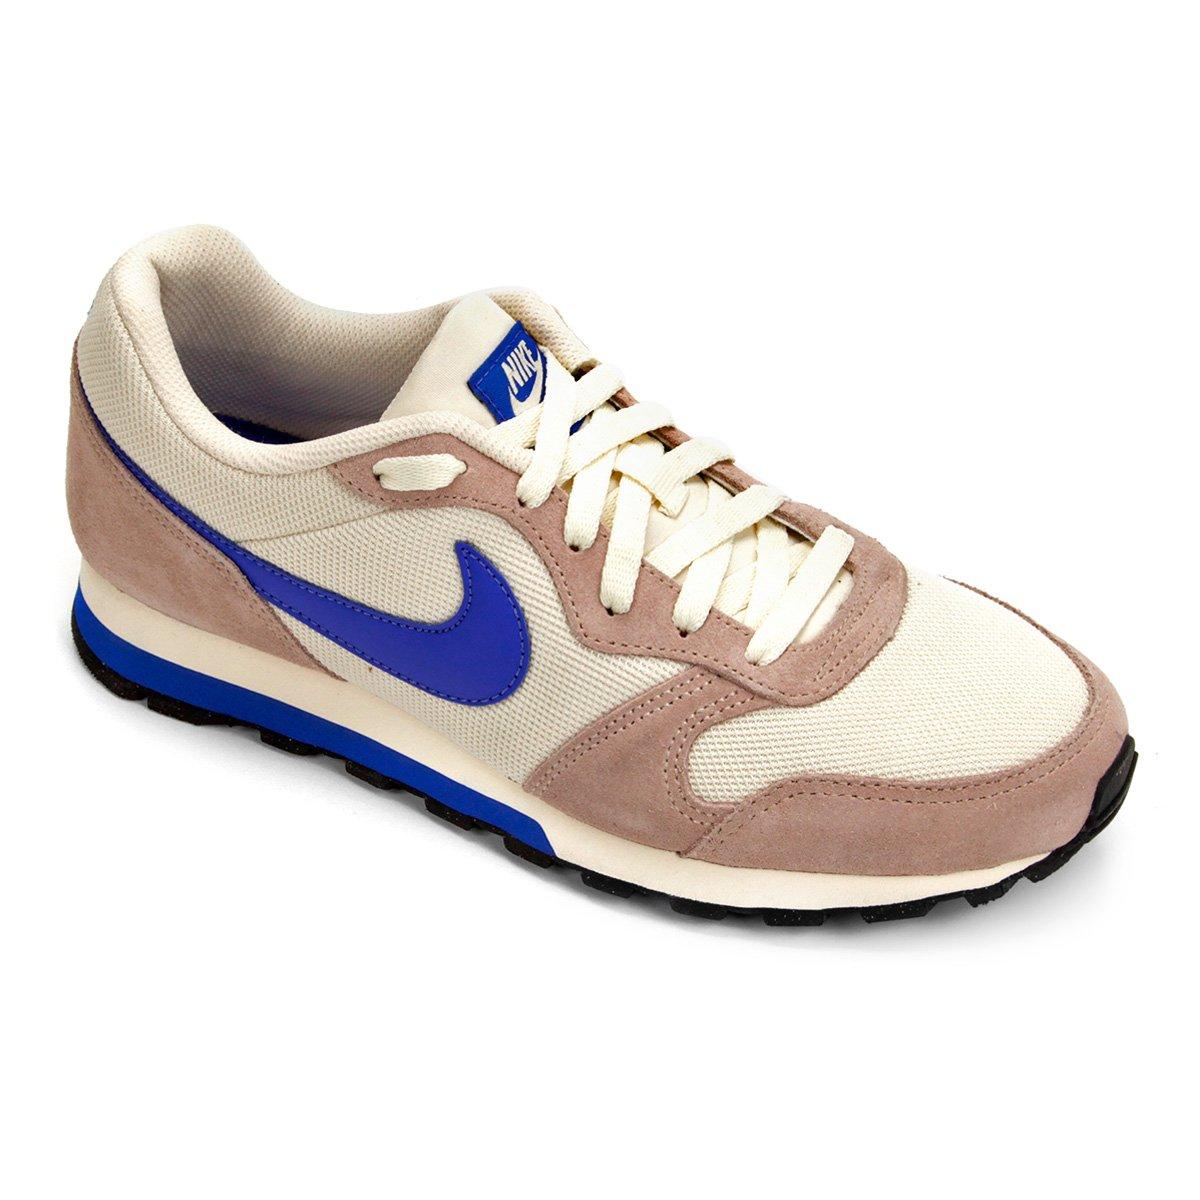 78cf09bf52 Tênis Nike Md Runner 2 Masculino - Azul Royal - Compre Agora